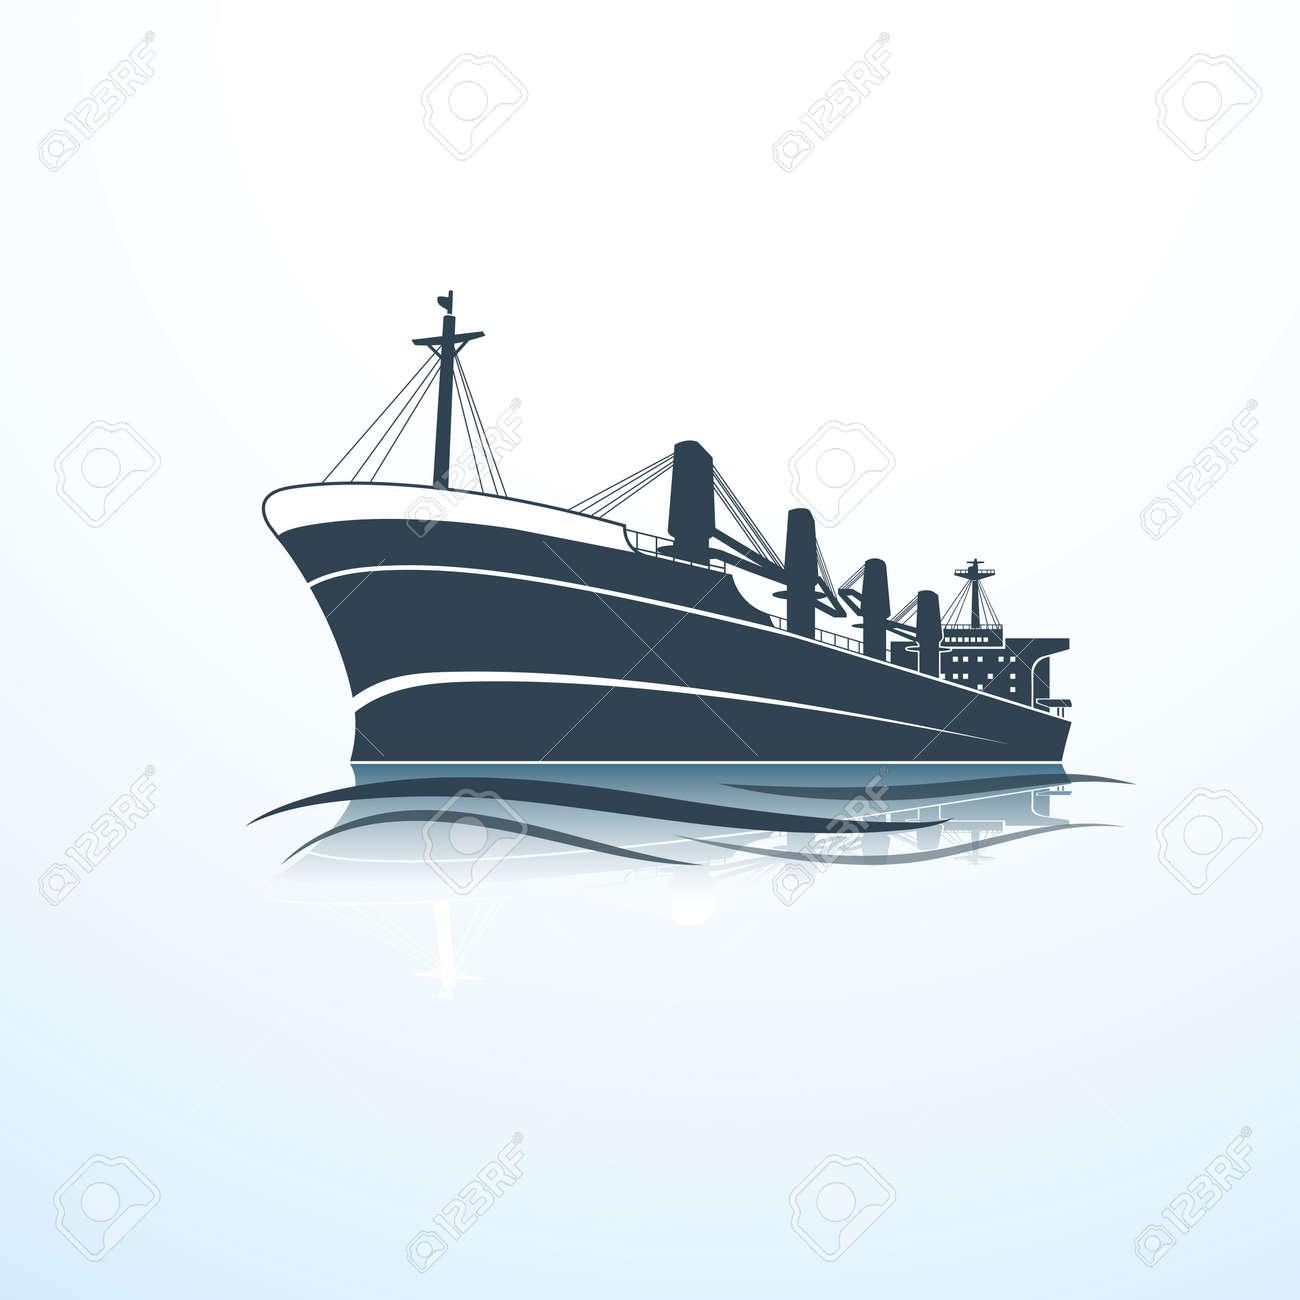 silhouettes of the sea cargo ship,vector illustration Stock Vector - 44695475